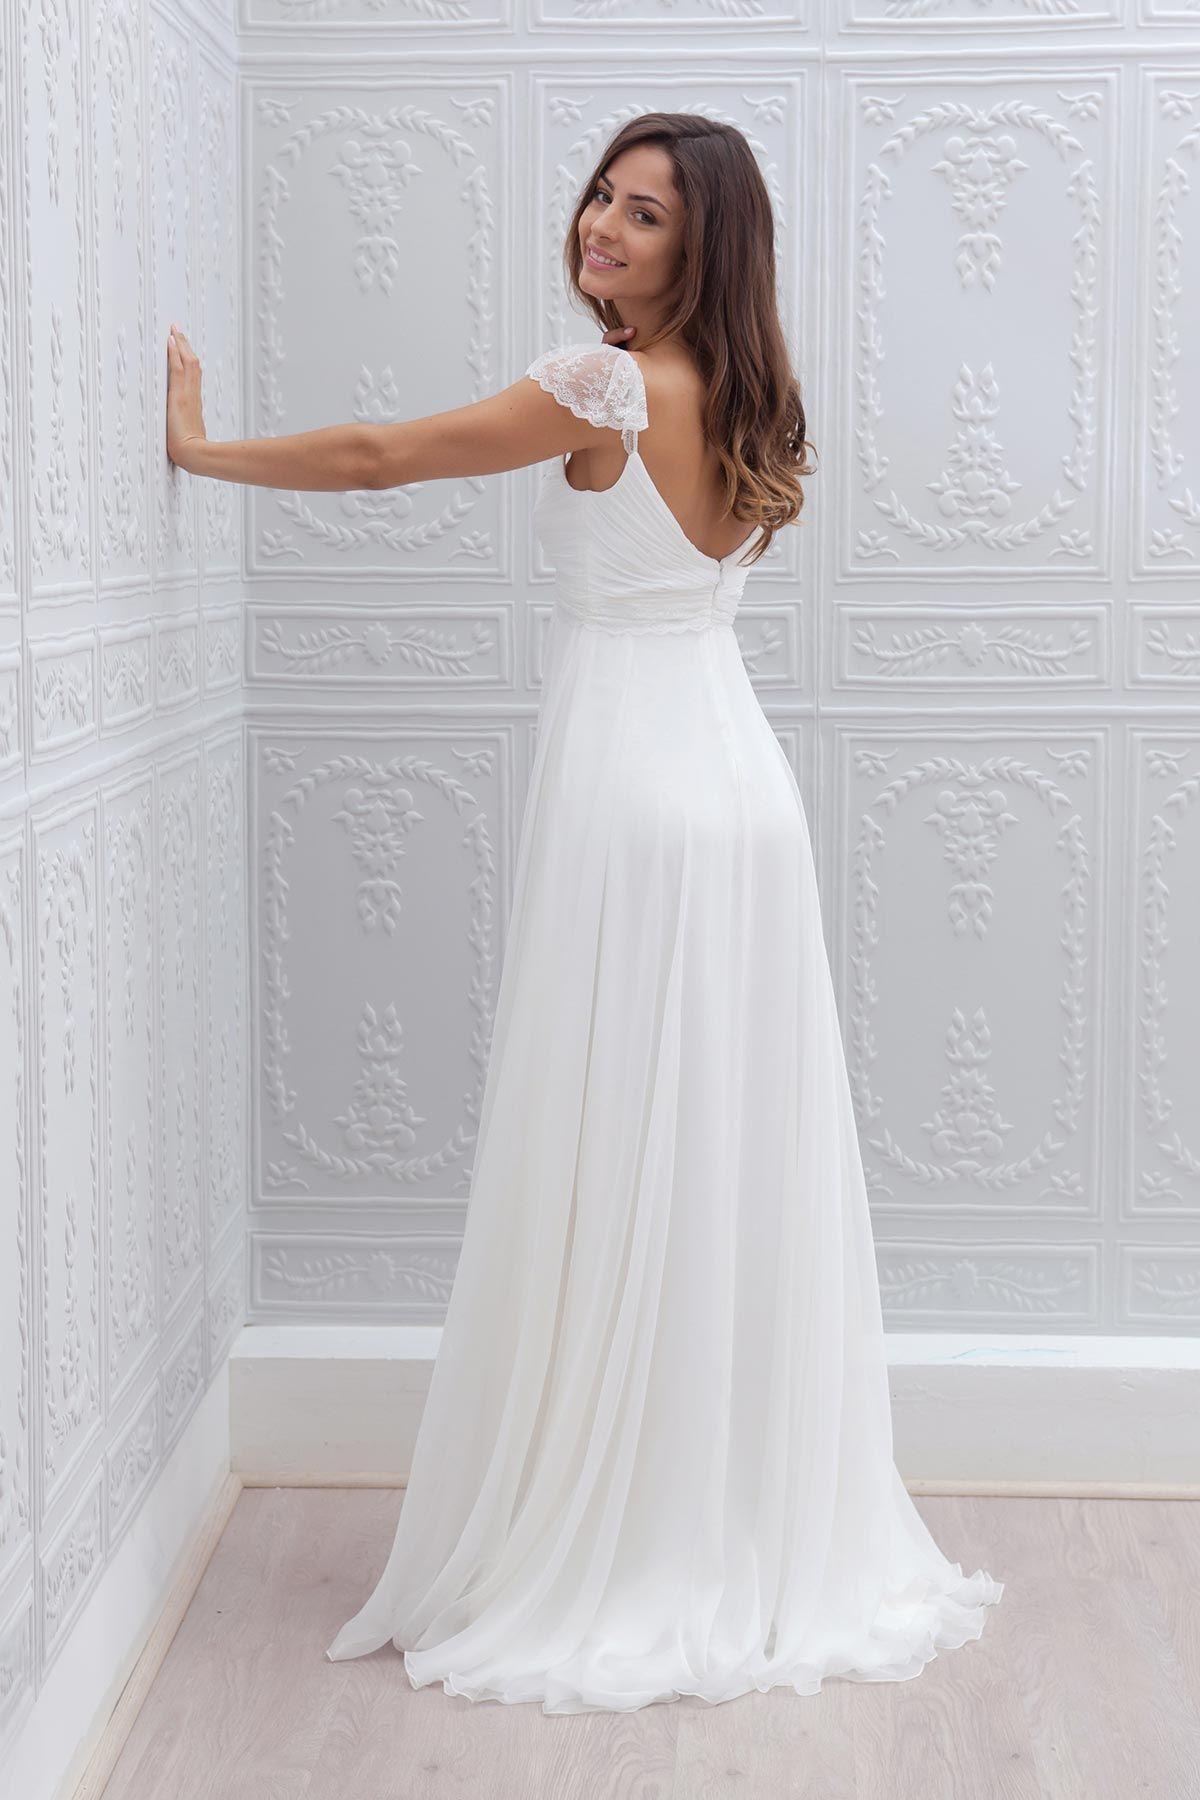 Dresses for summer wedding reception  Joy  Marie laporte  robe  Pinterest  Wedding dress Wedding and